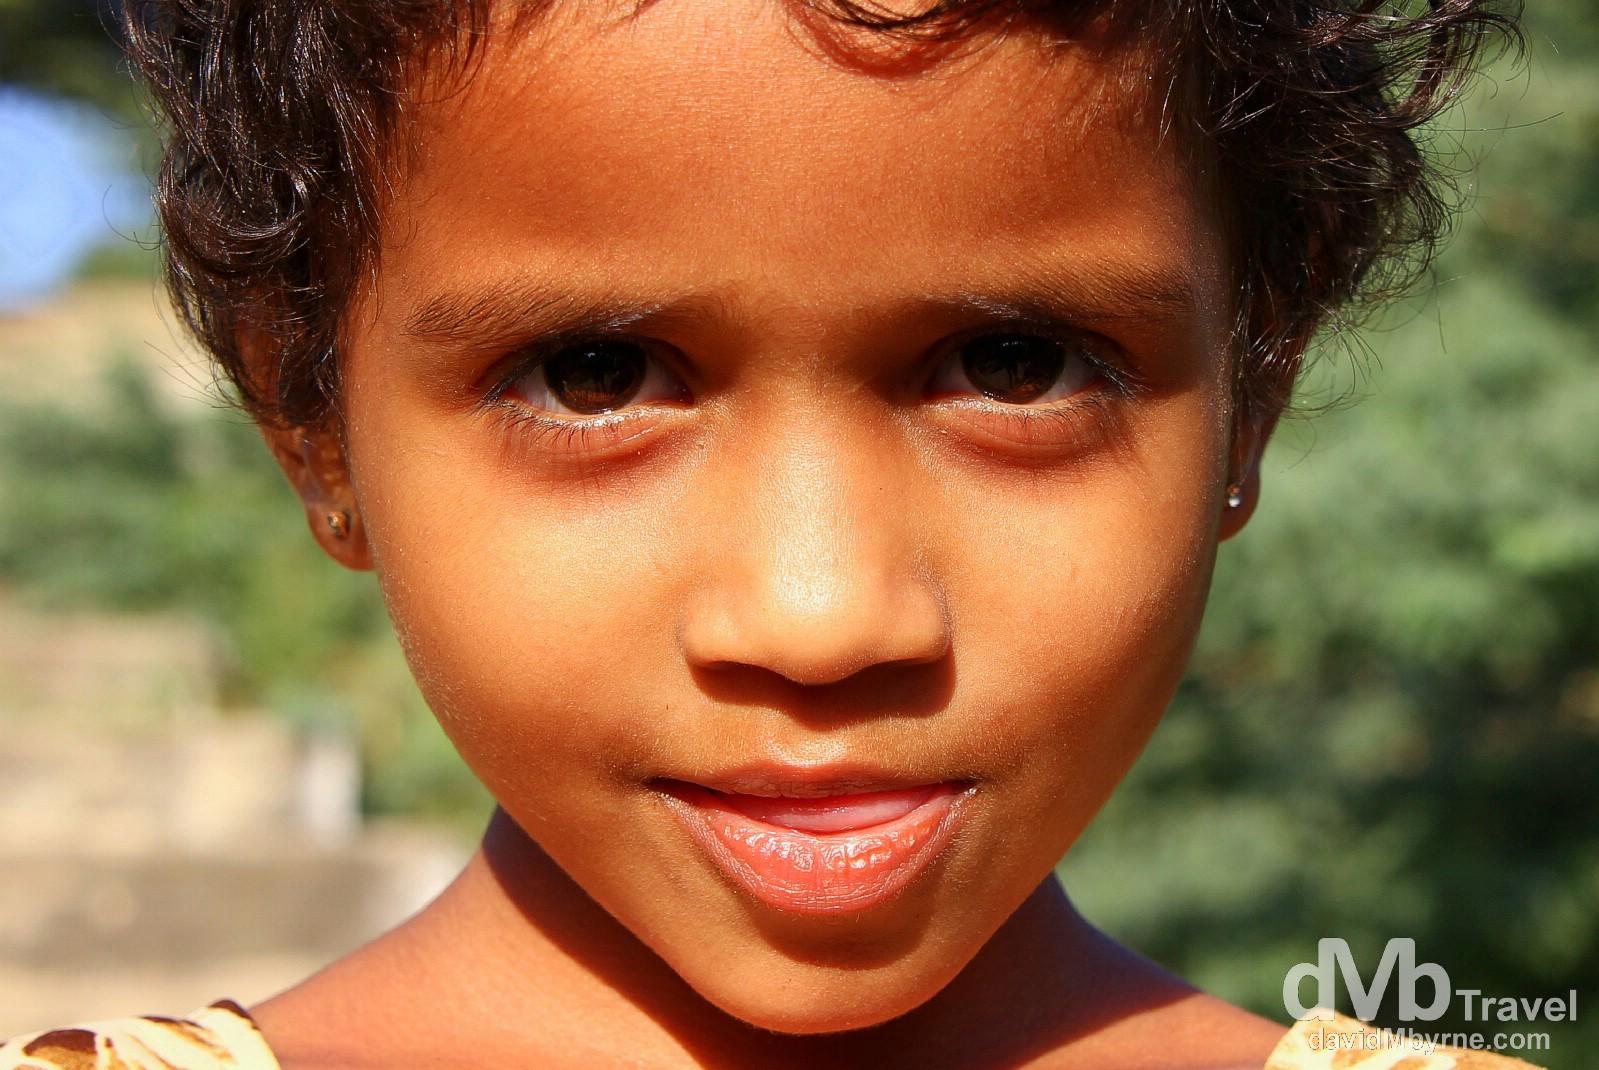 jpg4 India Gallery | Worldwide Destination Photography & Insights